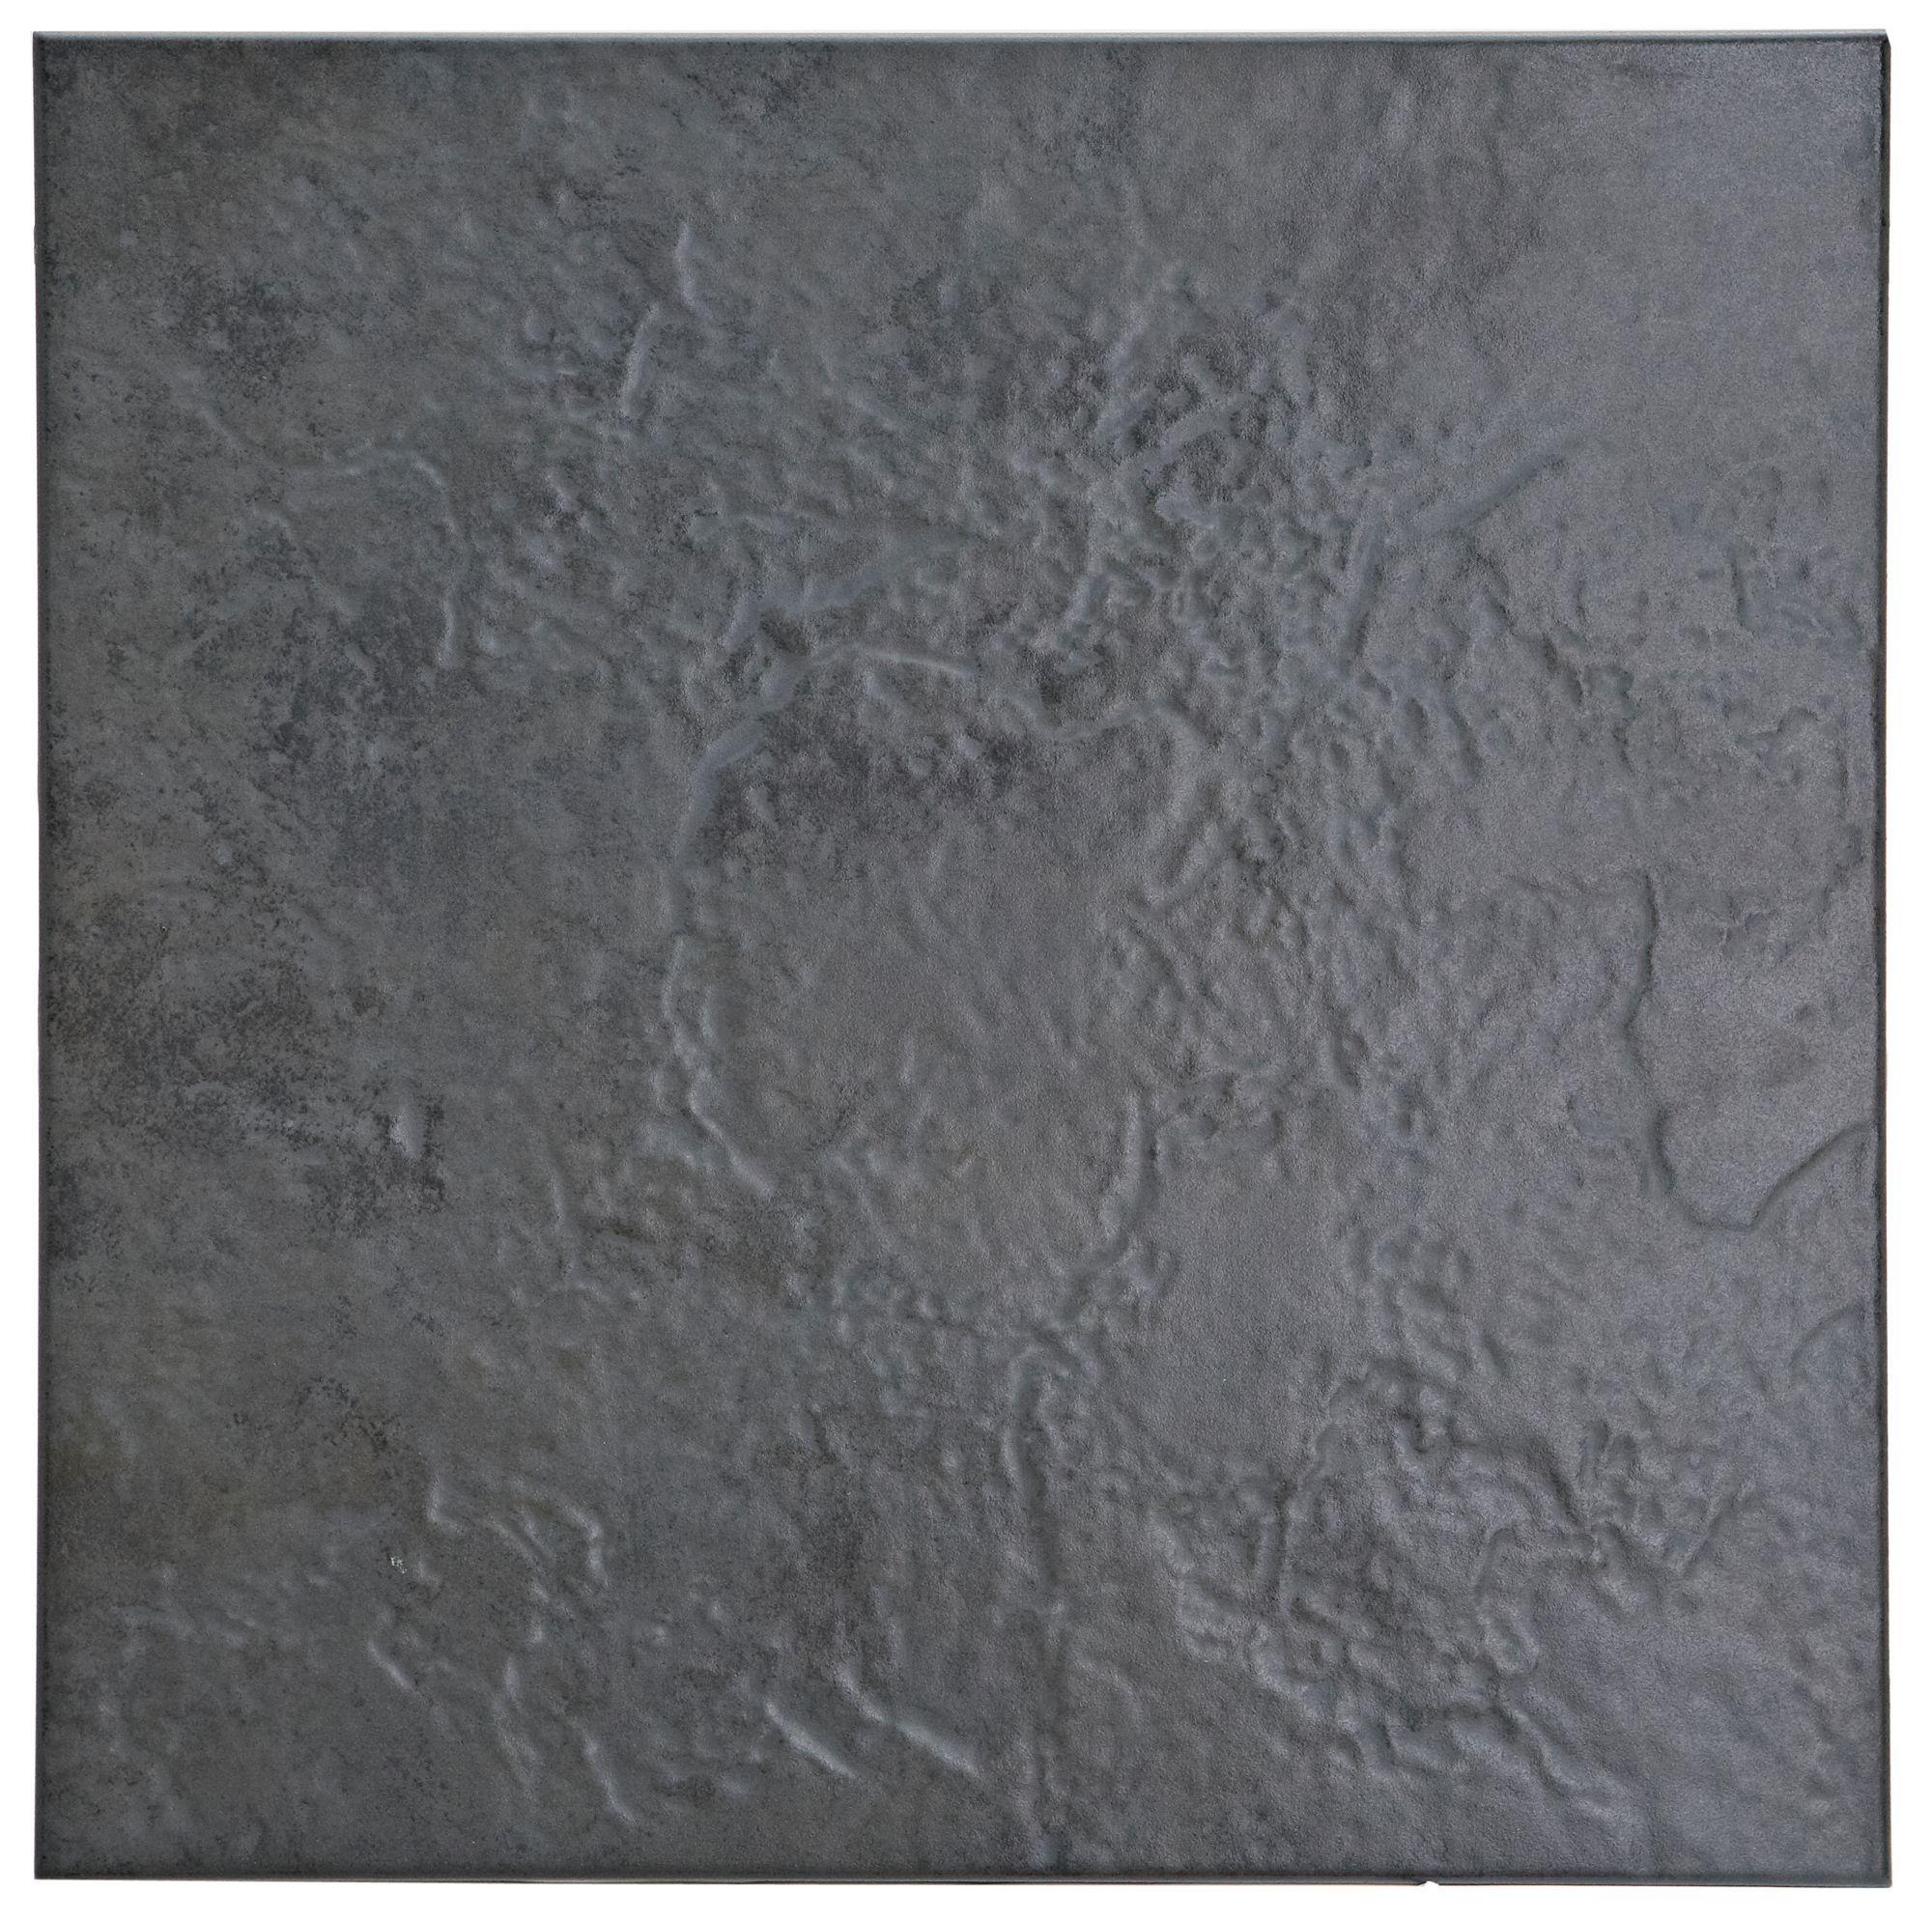 Cirque Black Ceramic Floor Tile Pack Of 9 L 333mm W 333mm